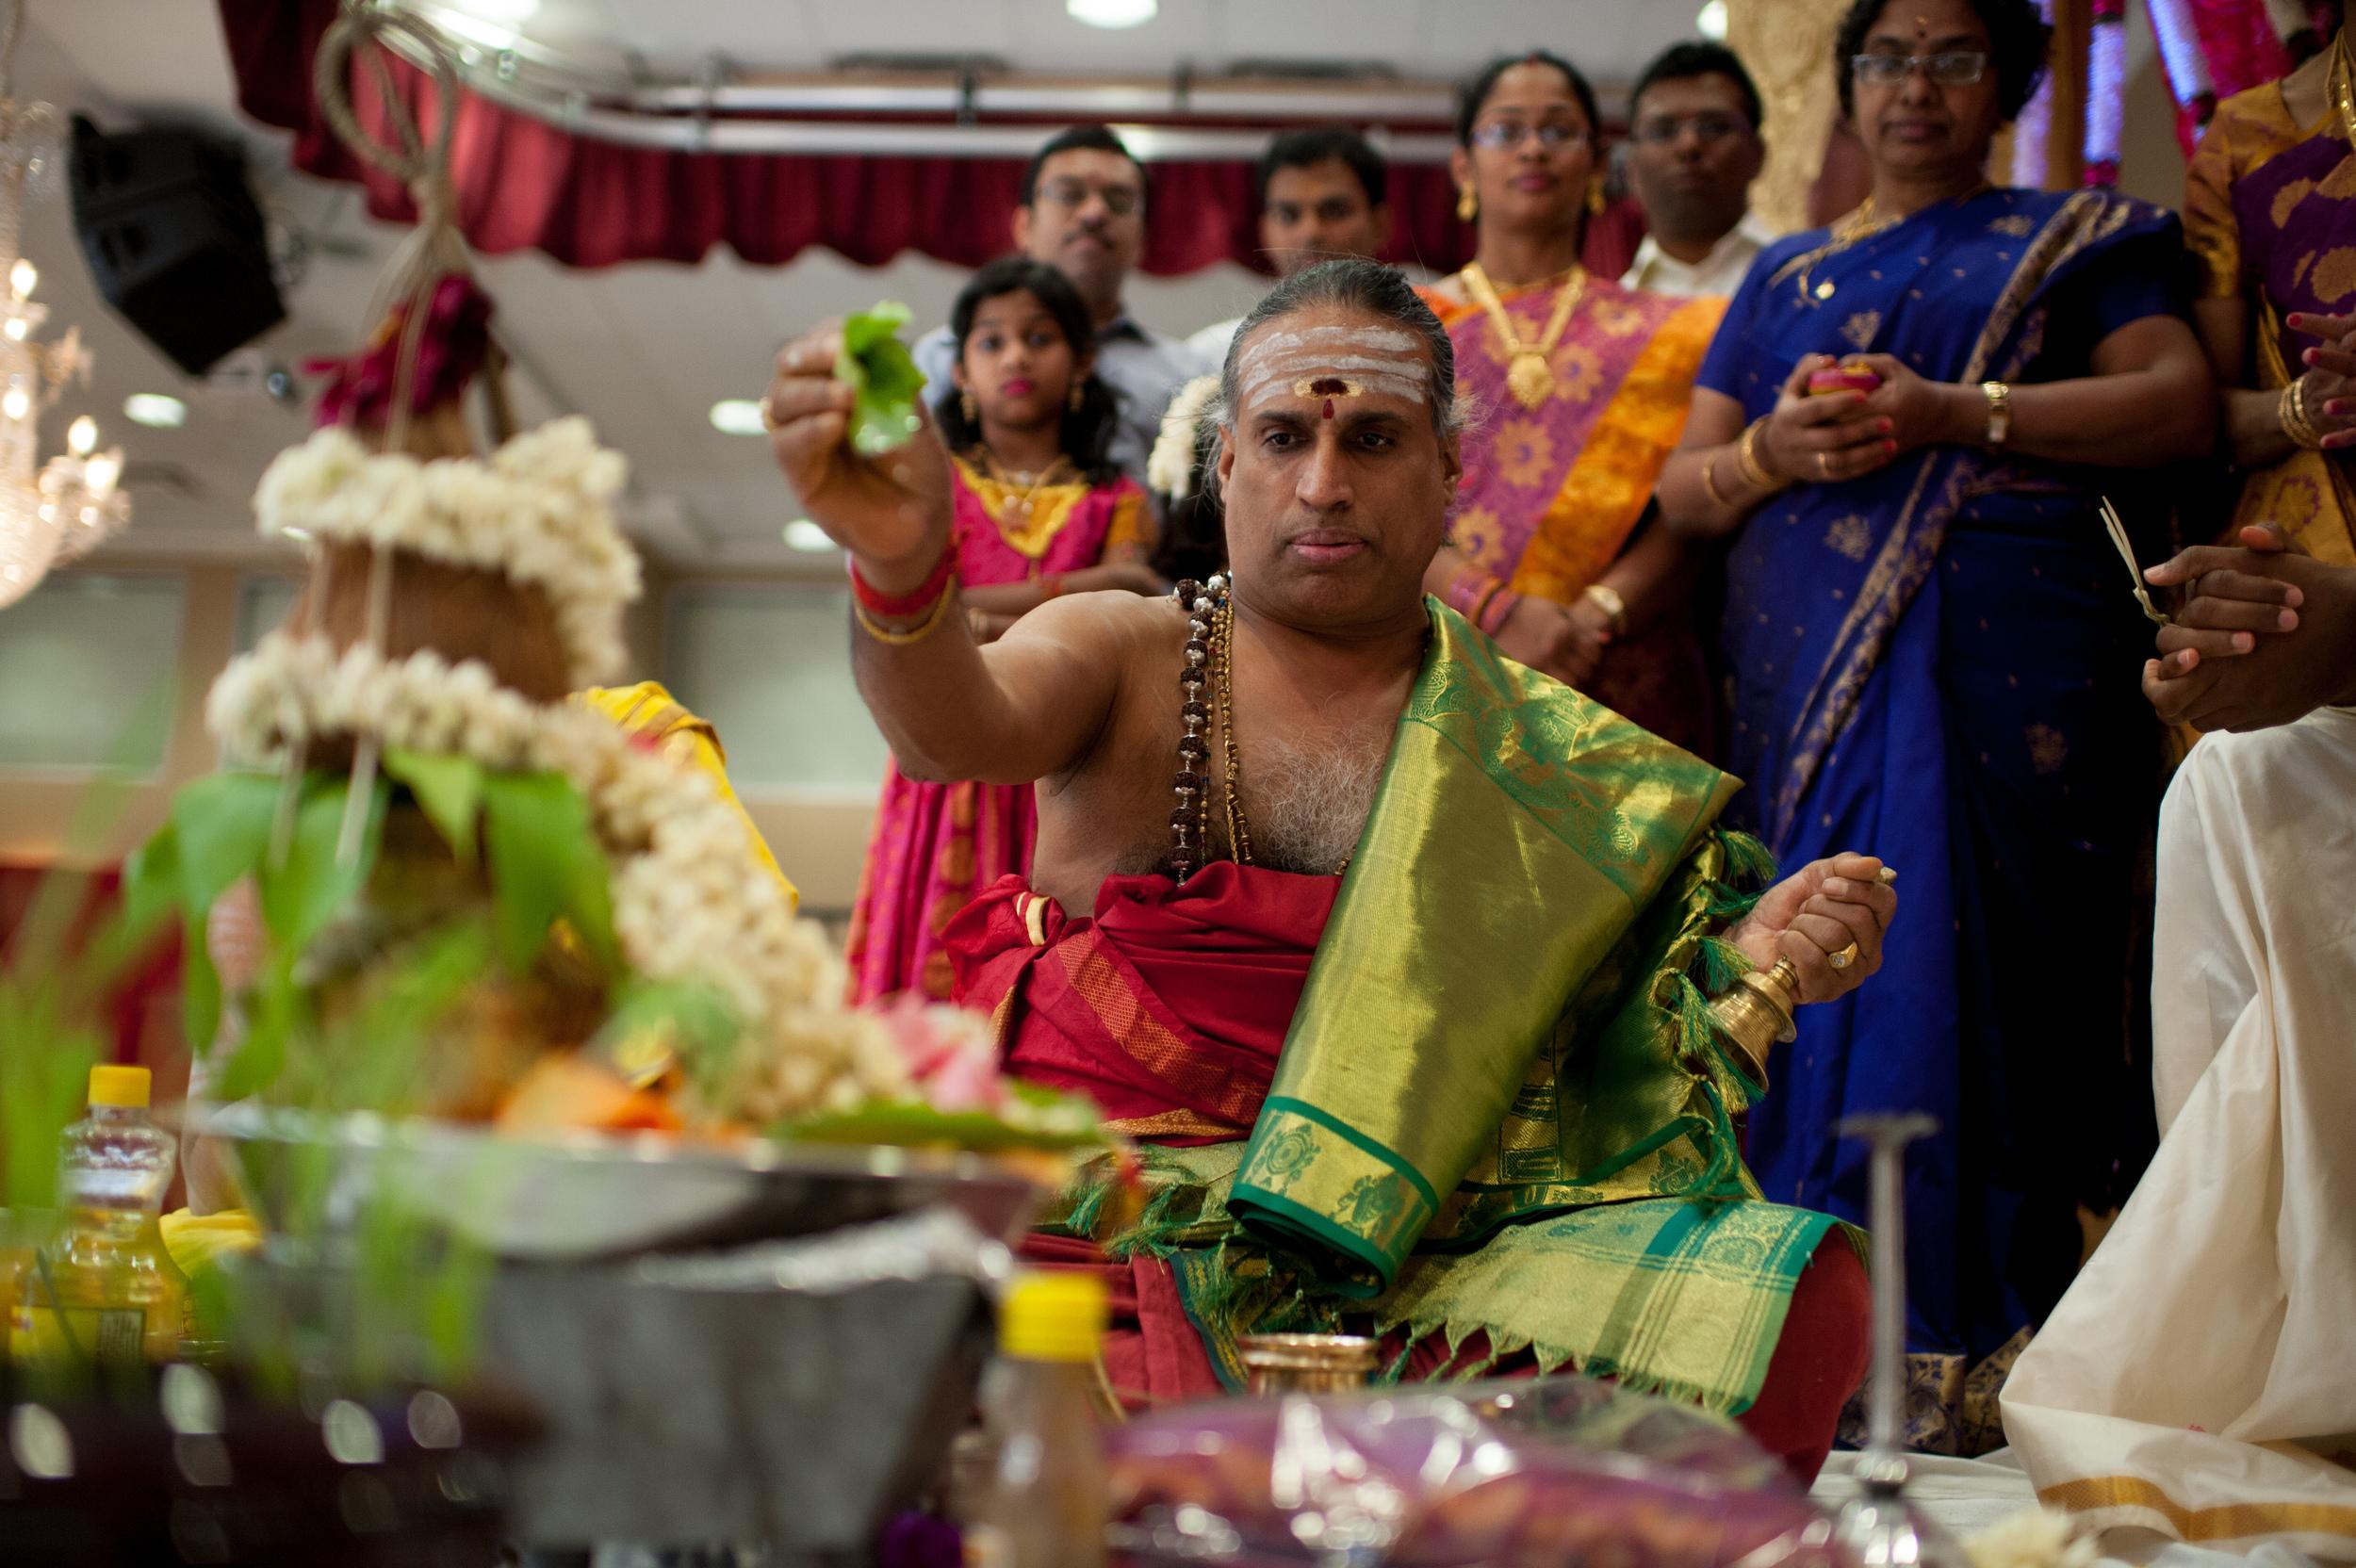 toronto-hindu-wedding-003.jpg